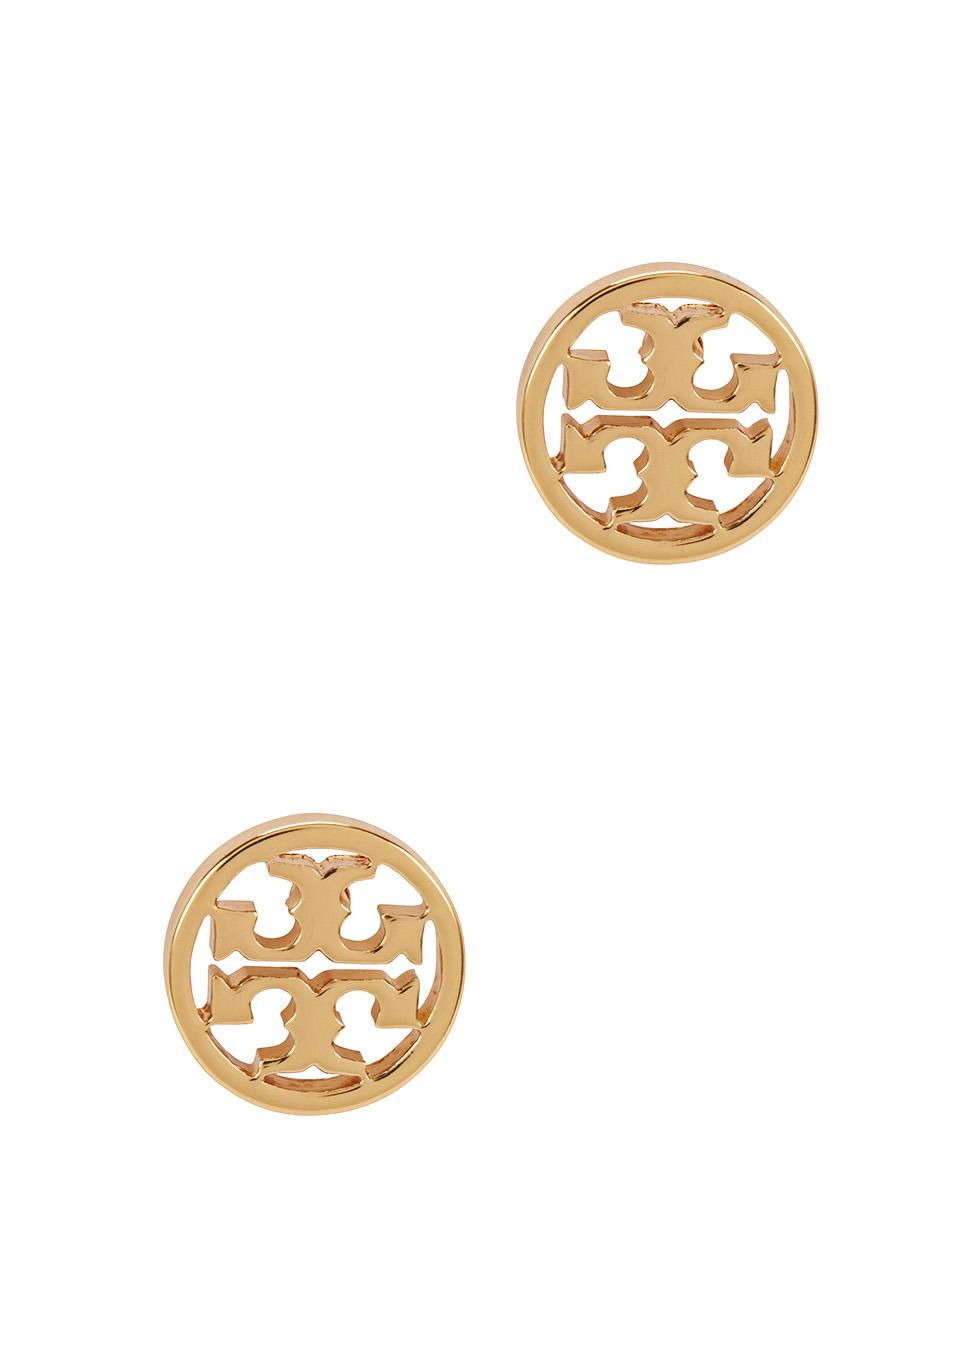 Gold-plated logo stud earrings - Tory Burch